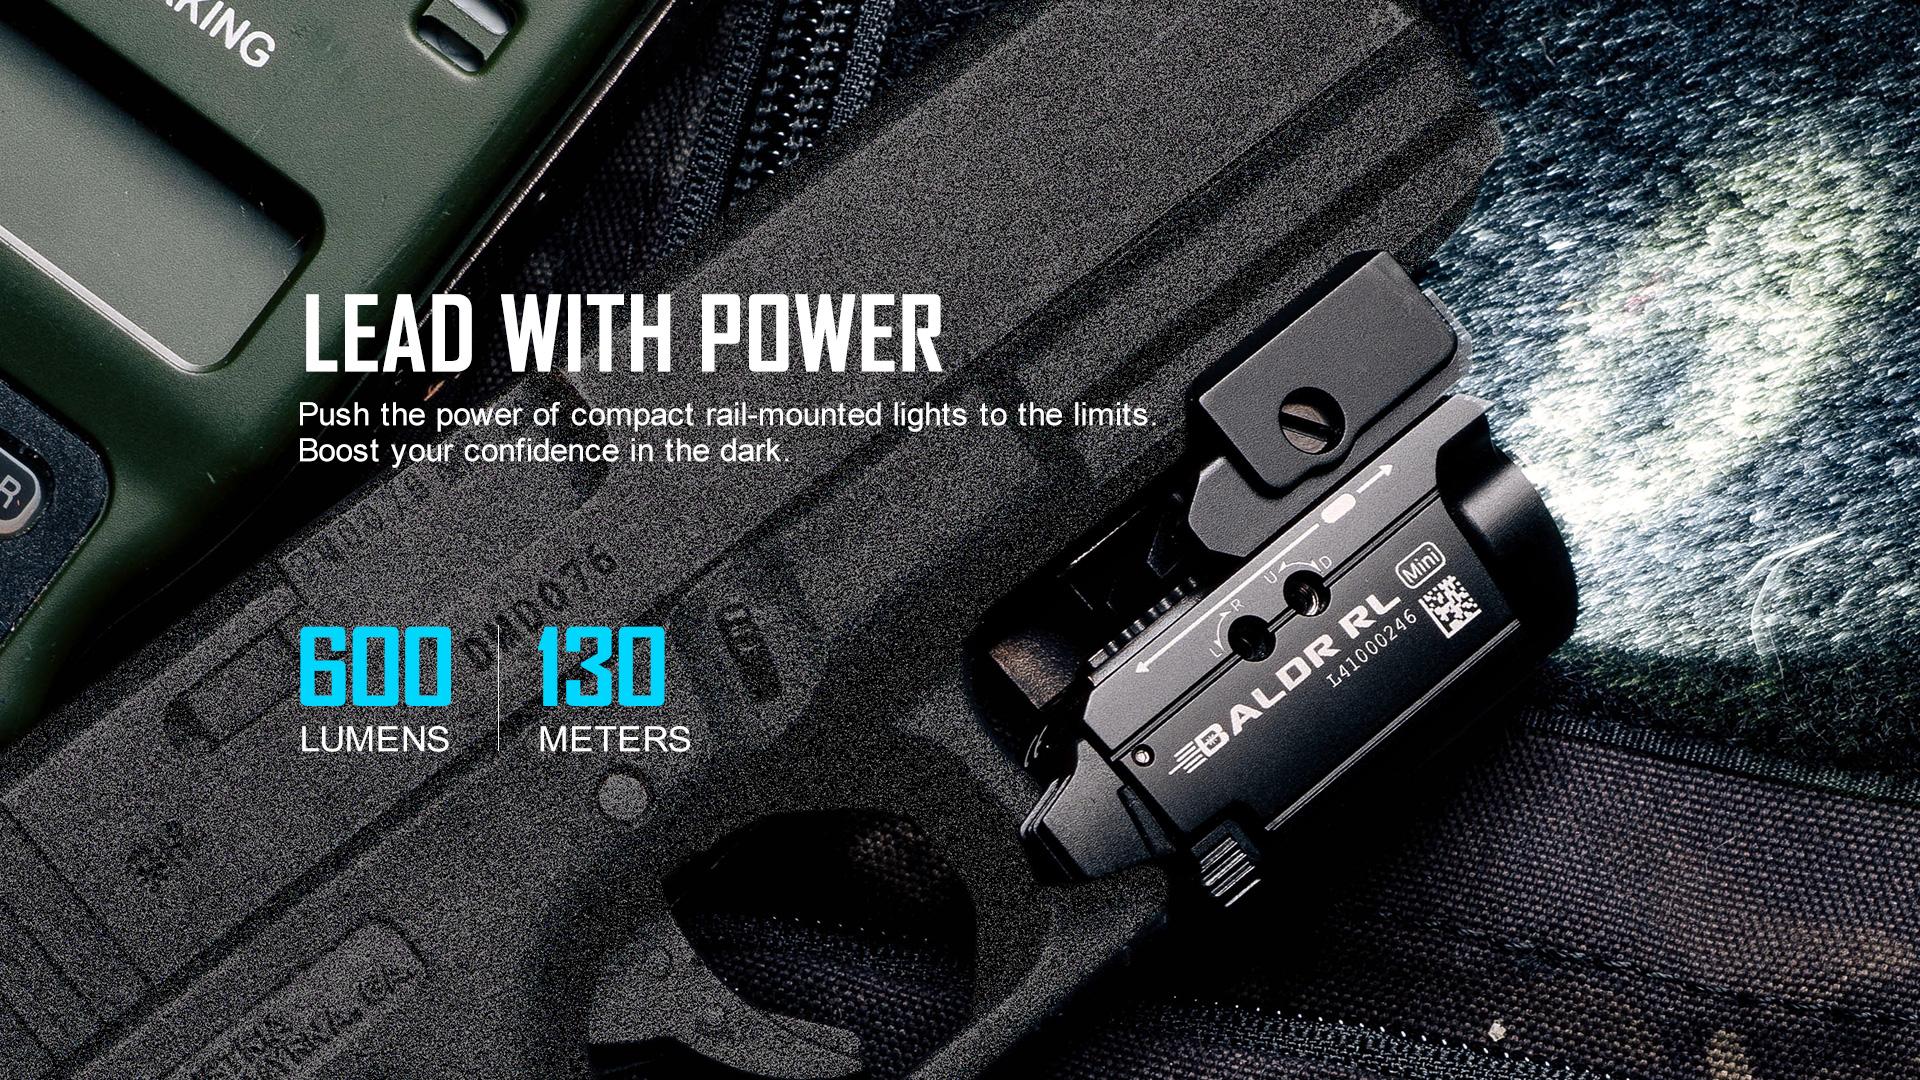 Baldr RL Mini Tactical Laser Flashlight lead with power